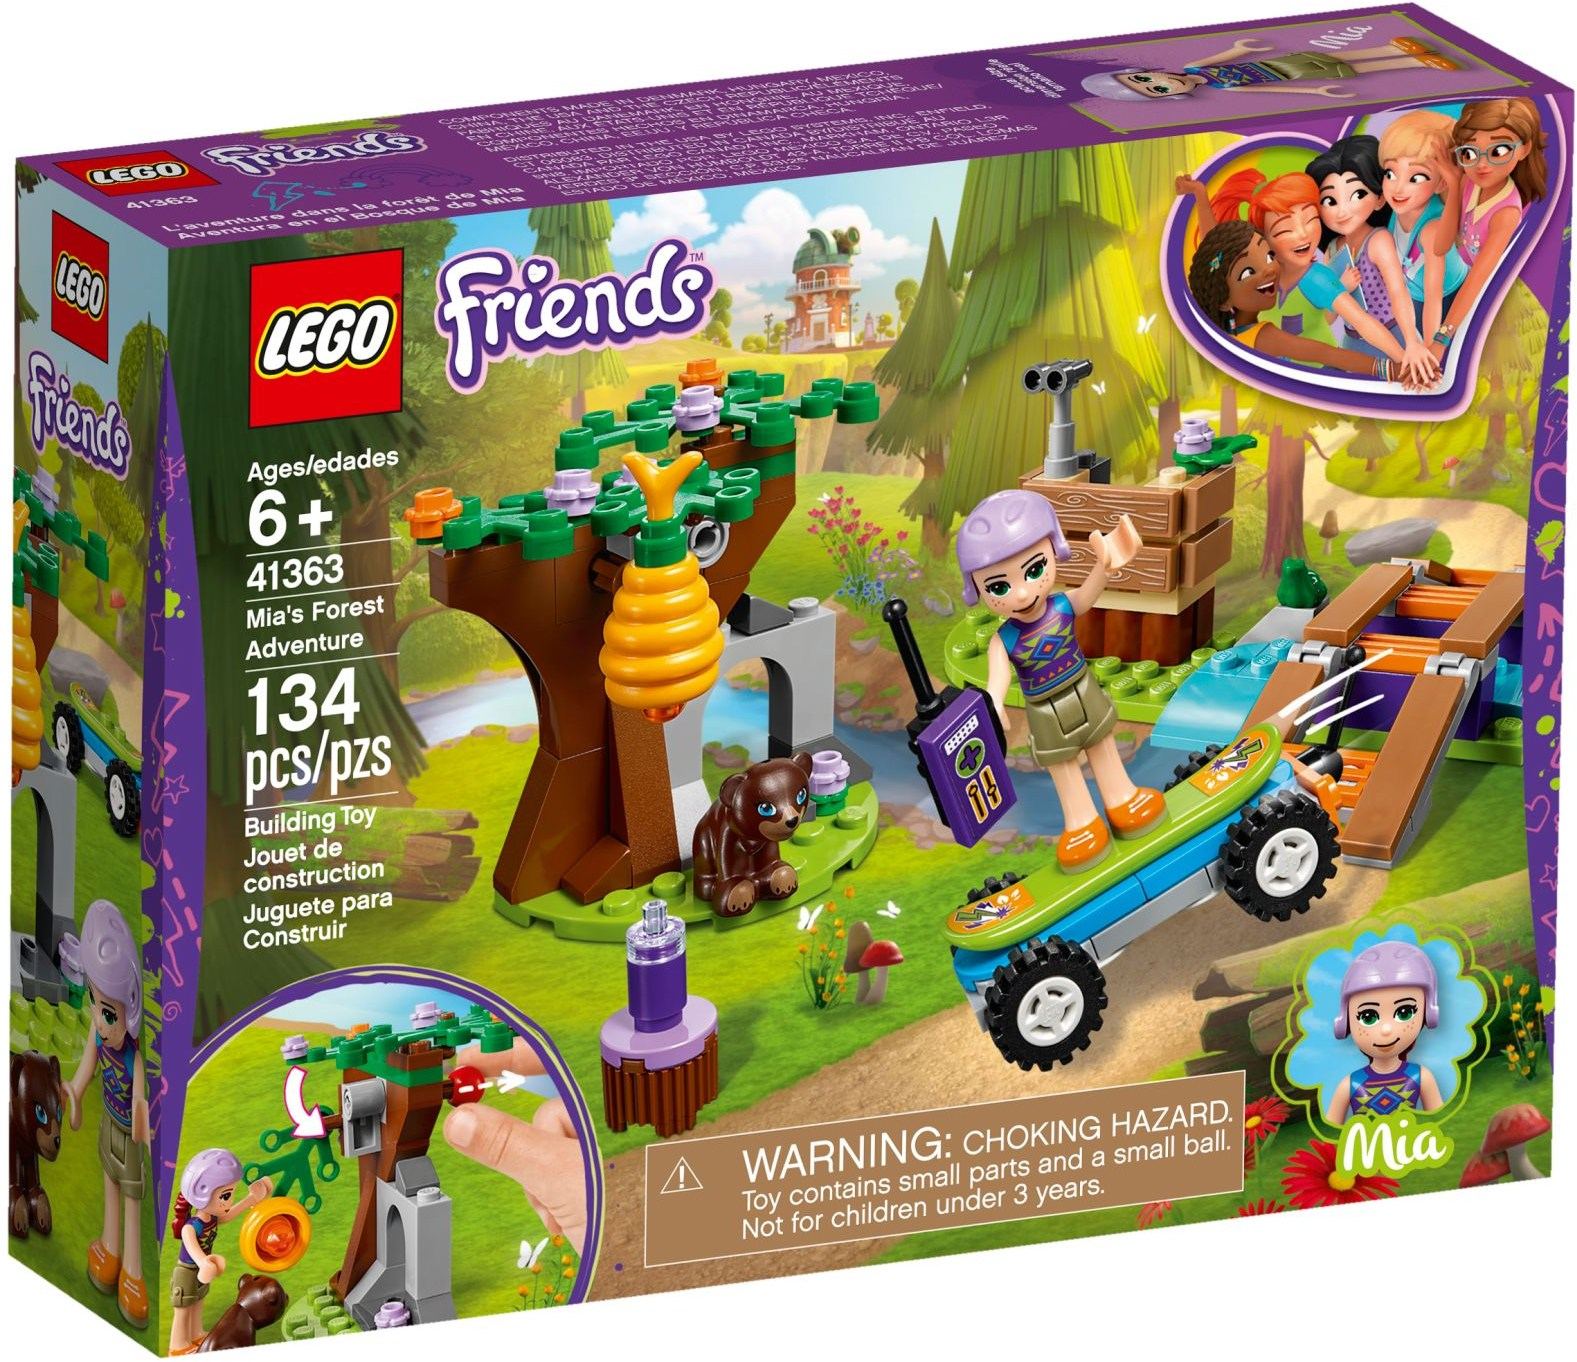 Mias Forest Adventure 41363 Lego Friends Wiki Fandom Powered